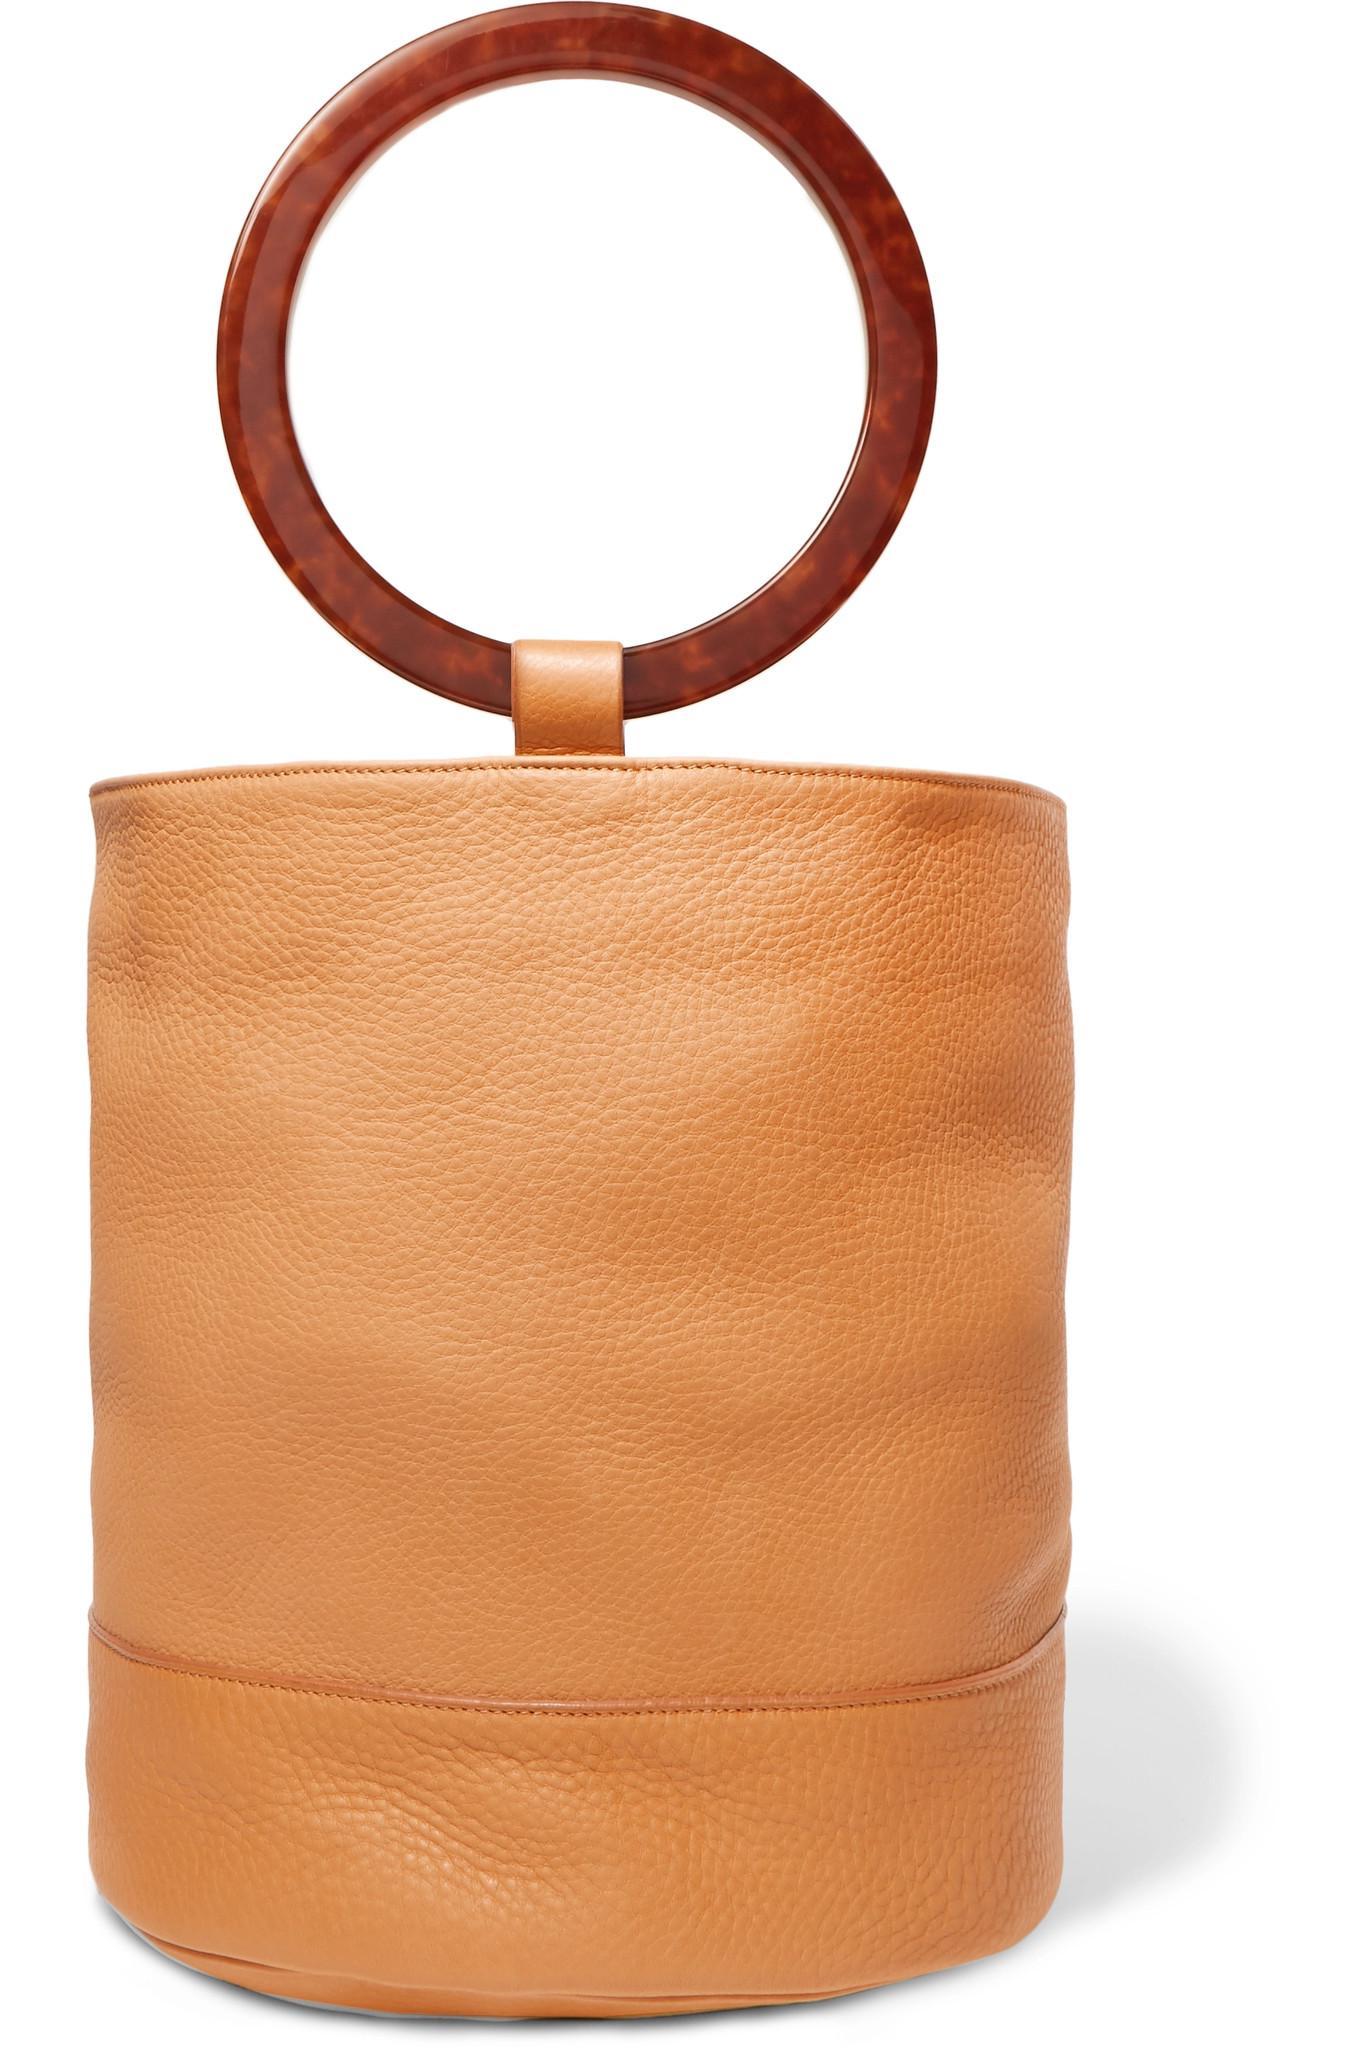 Bonsai 30 Nubuck Bucket Bag - Off-white Simon Miller 48izc